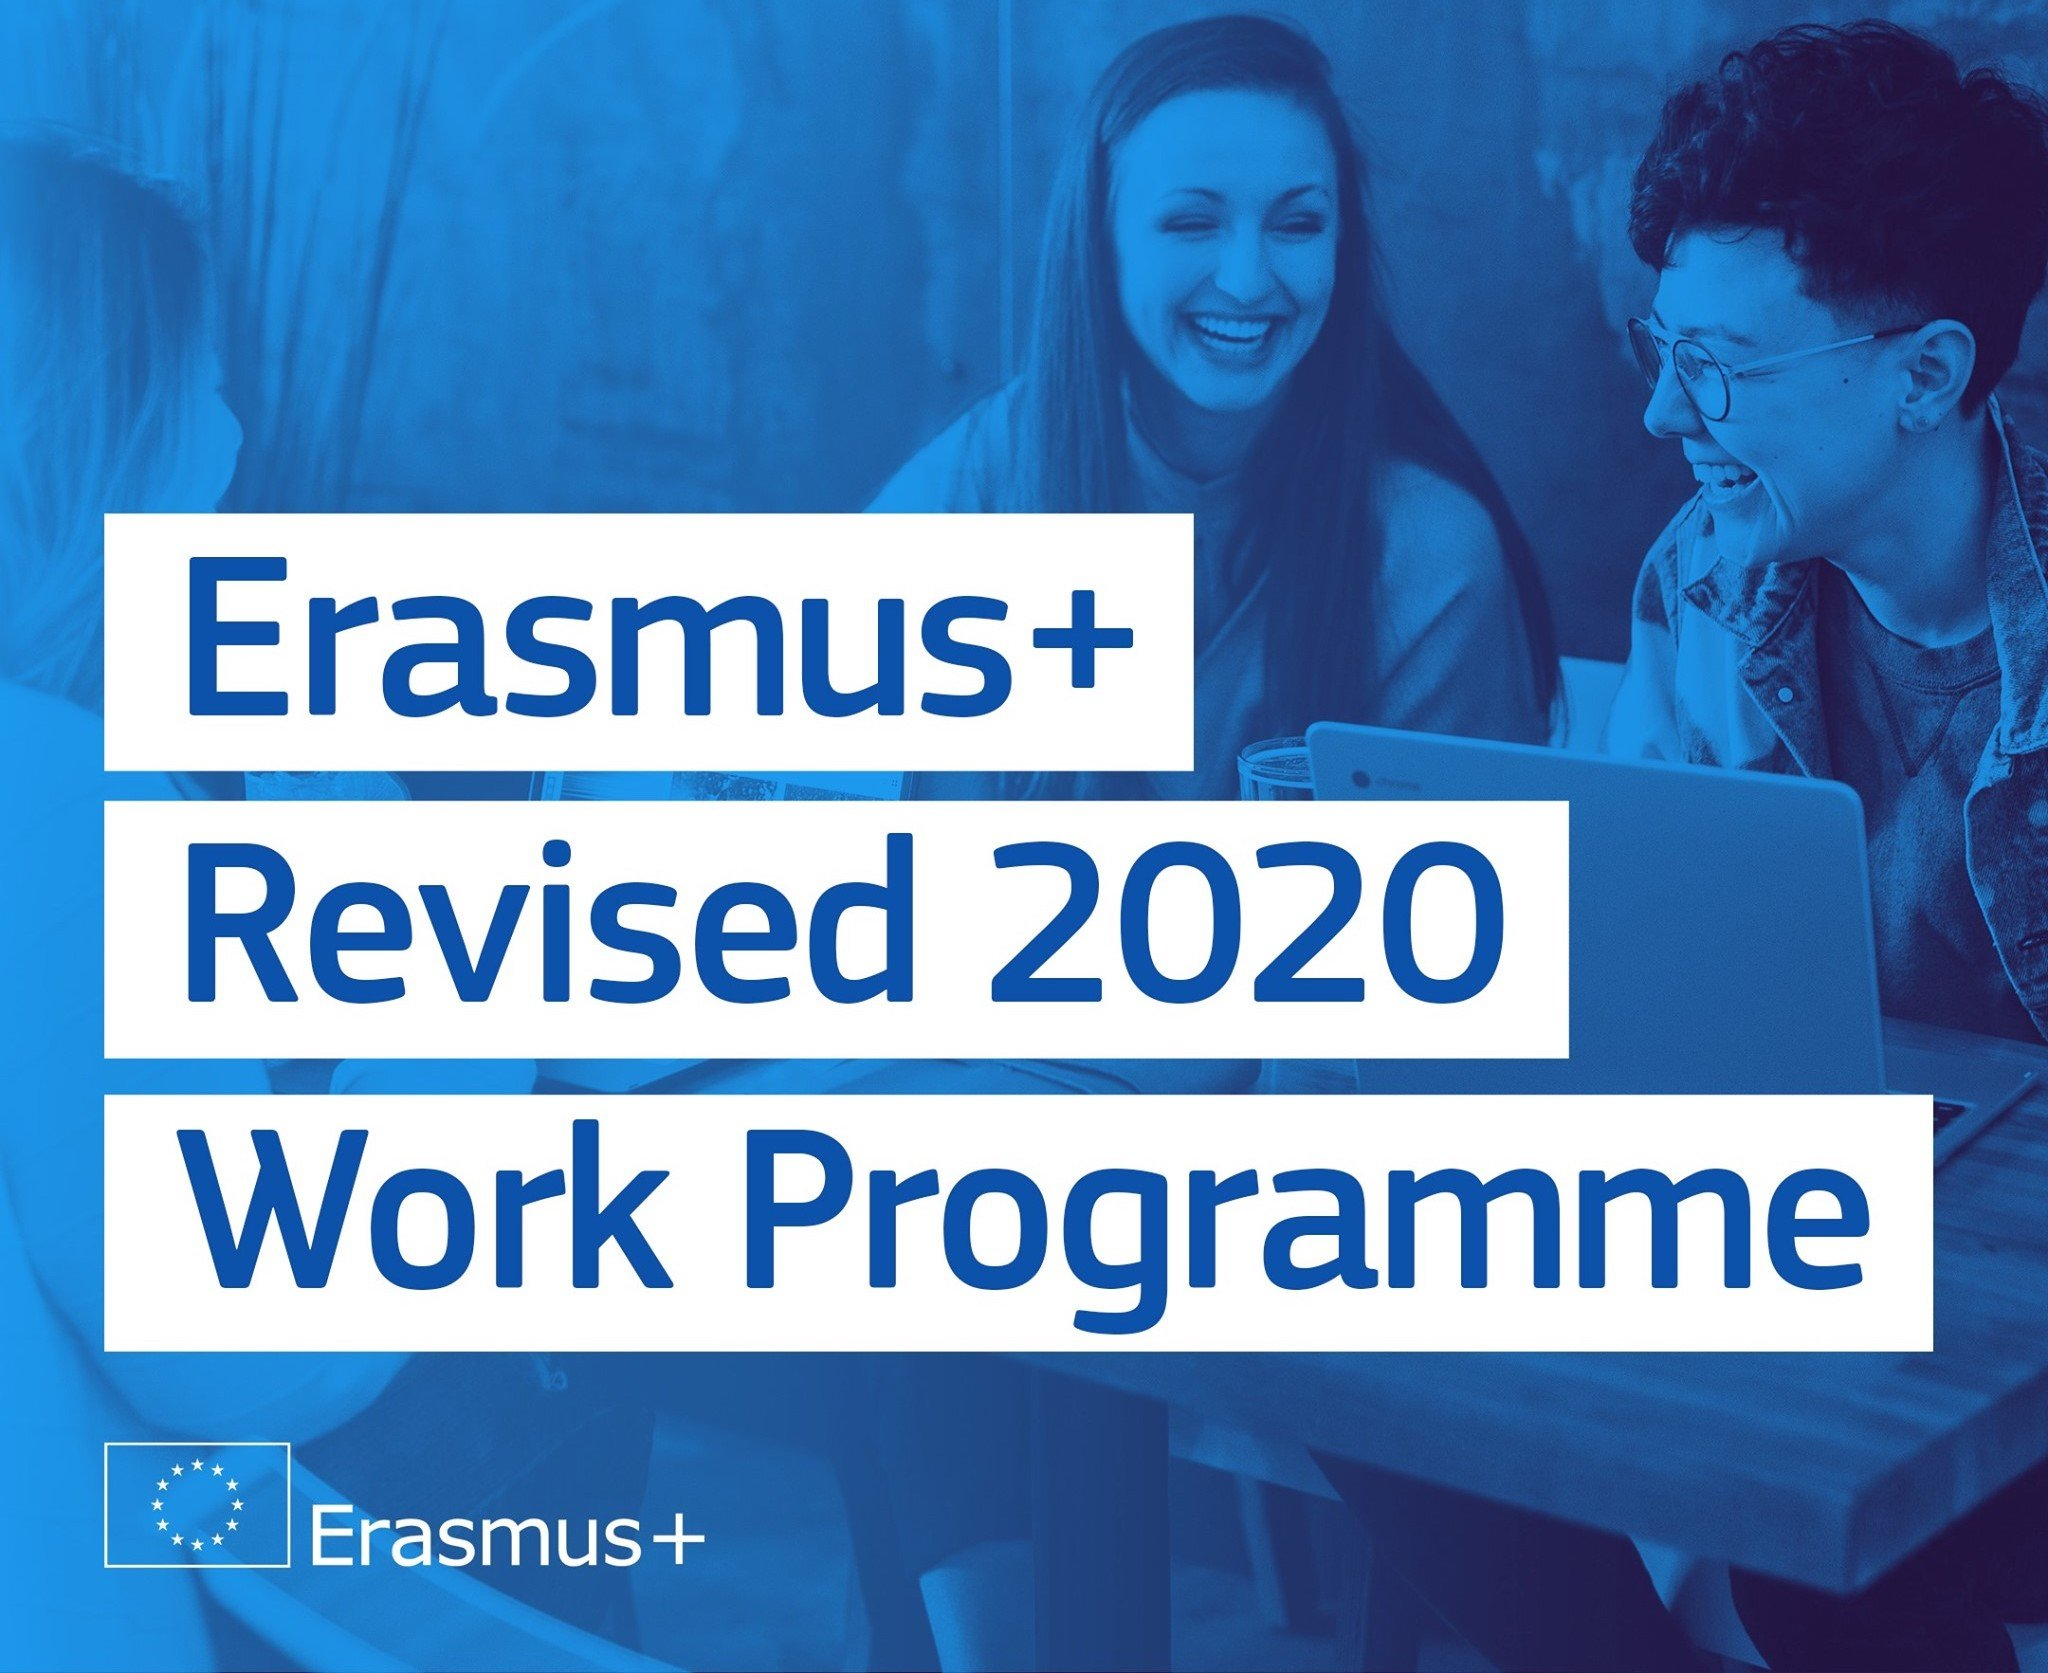 Erasmus+: Second Amendment - 2020 annual work programme